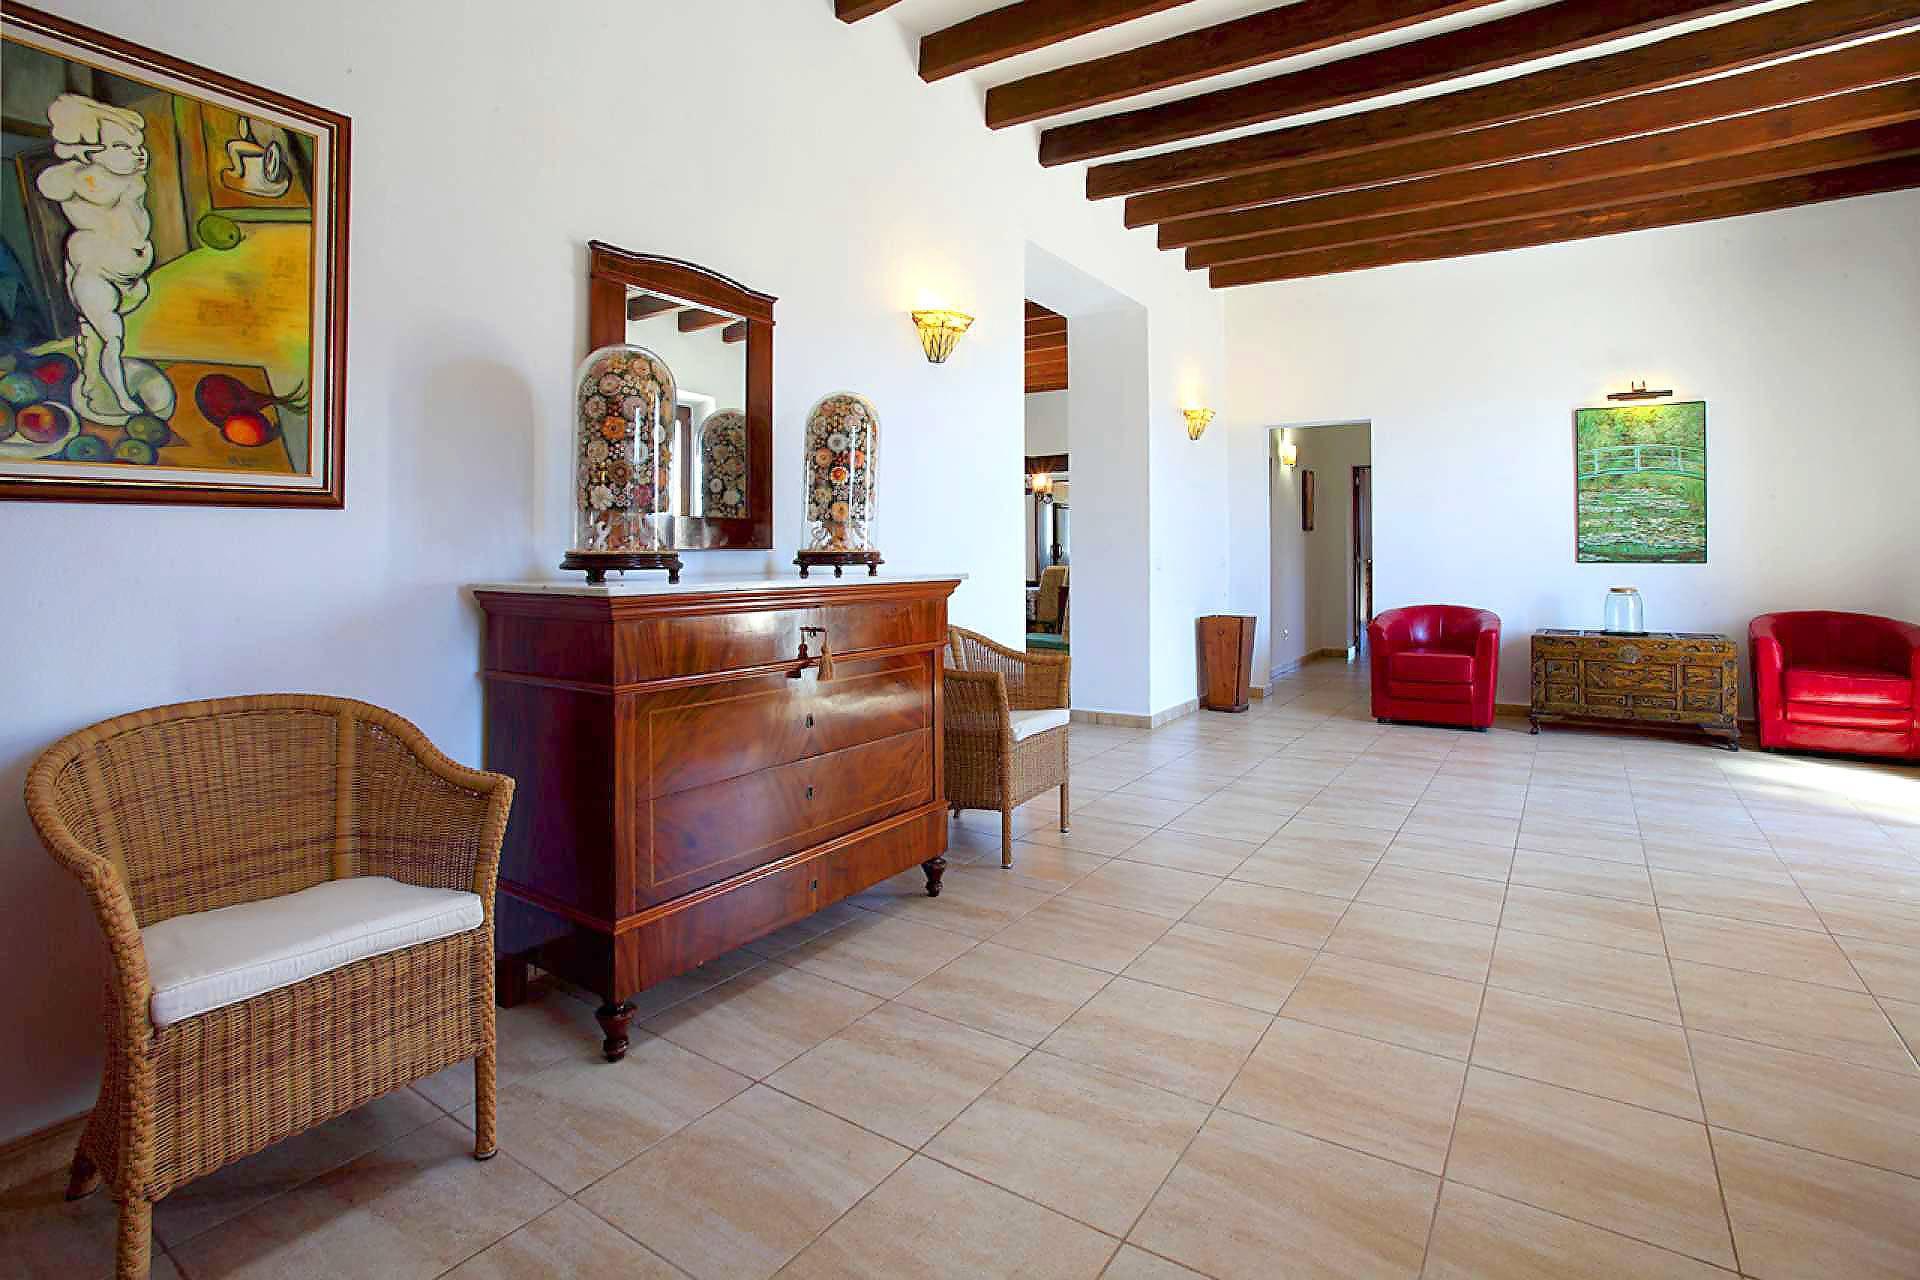 01-33 Großzügiges Ferienhaus Mallorca Osten Bild 18